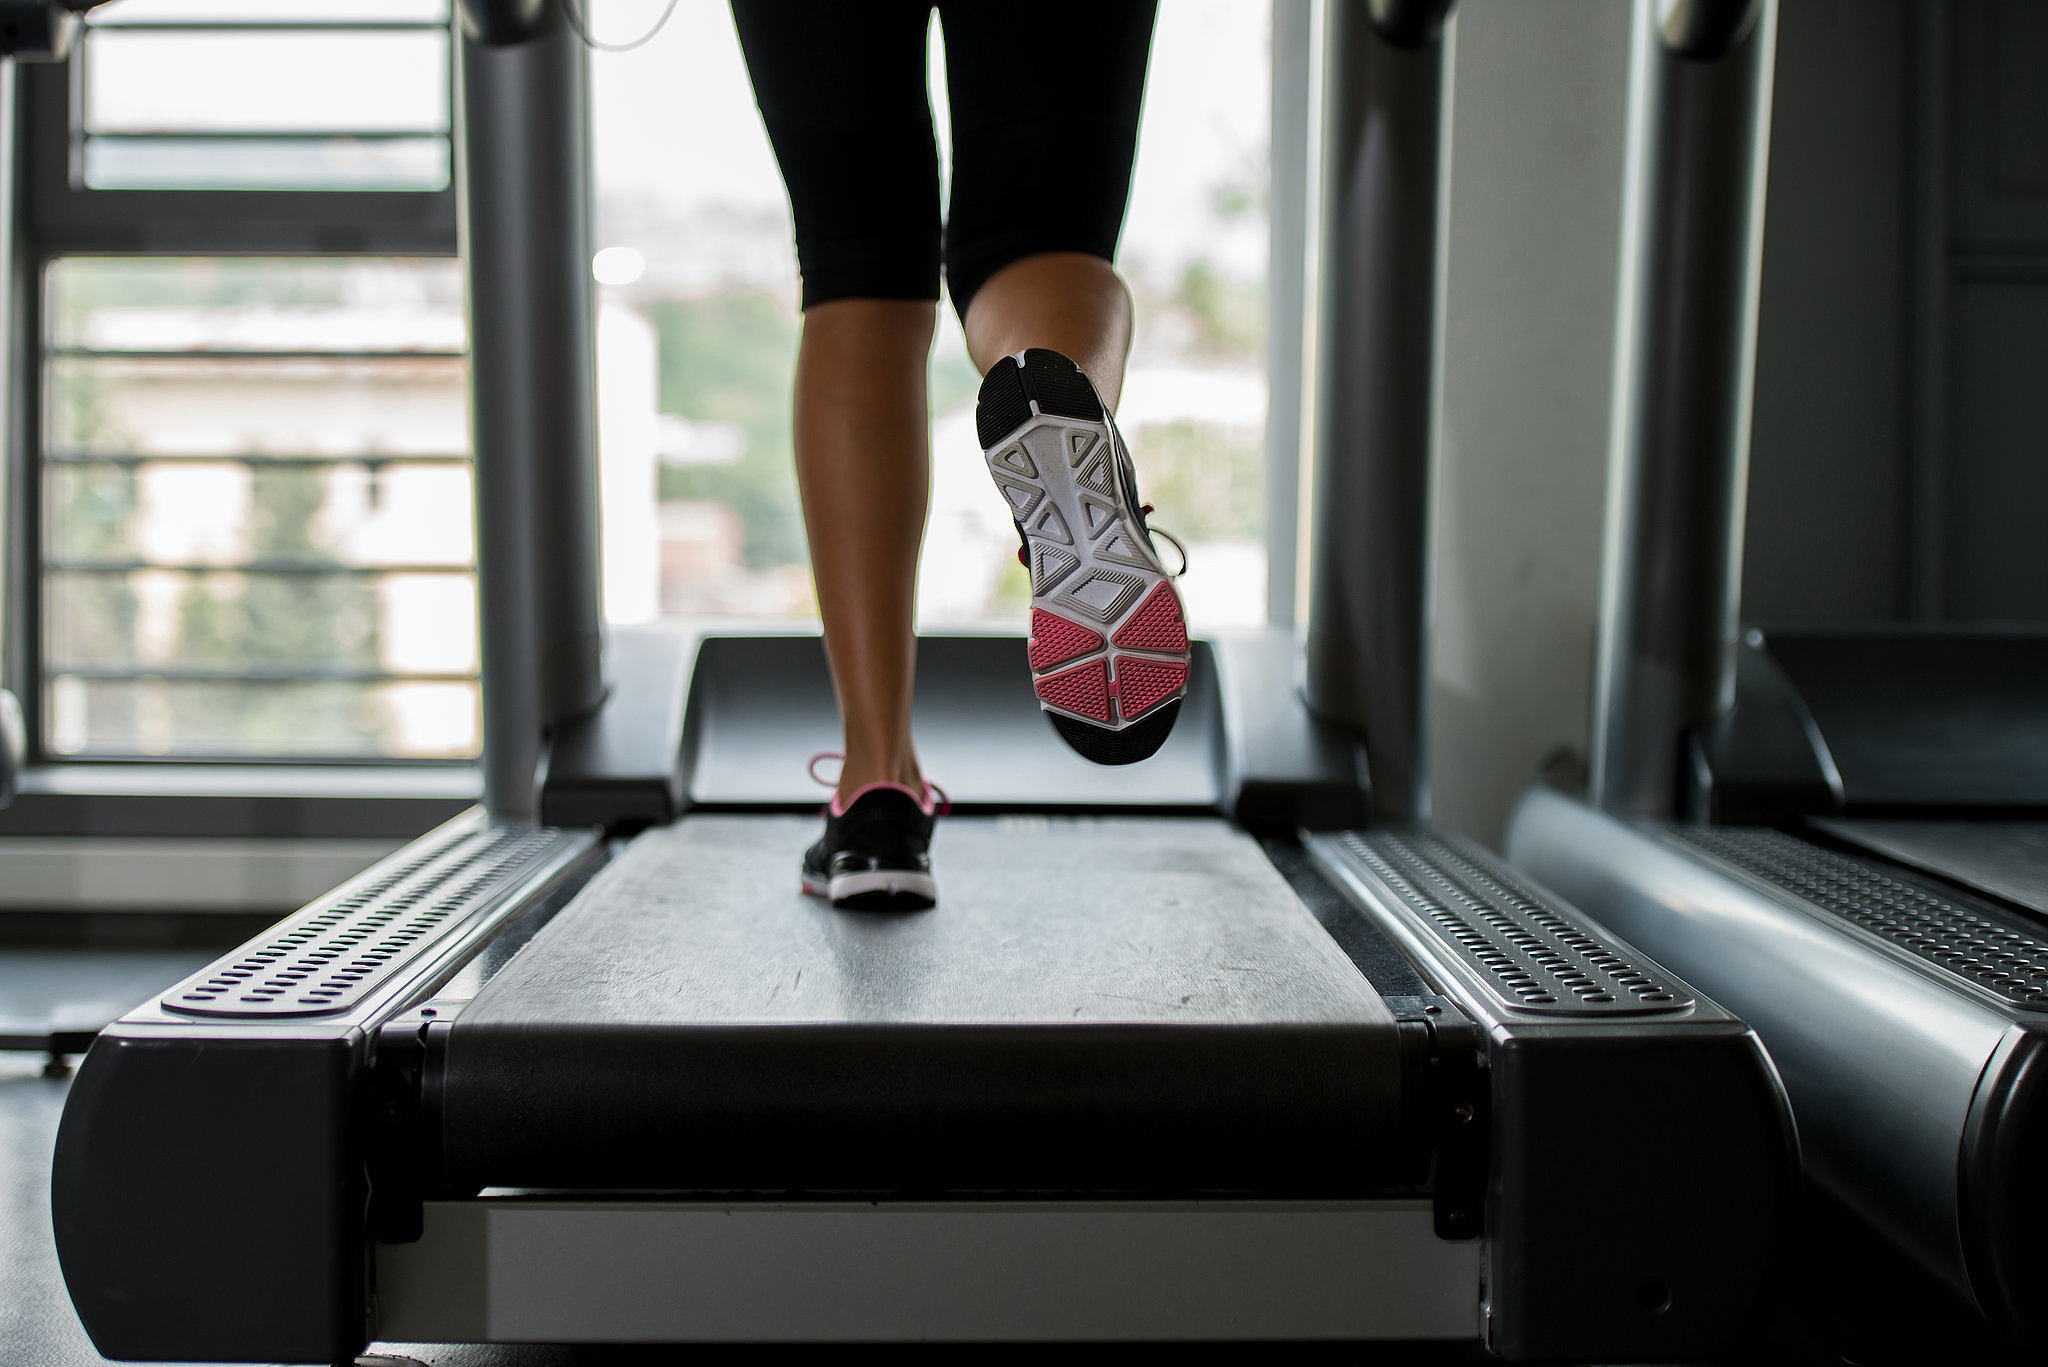 30 minute treadmill workout popsugar celebrity